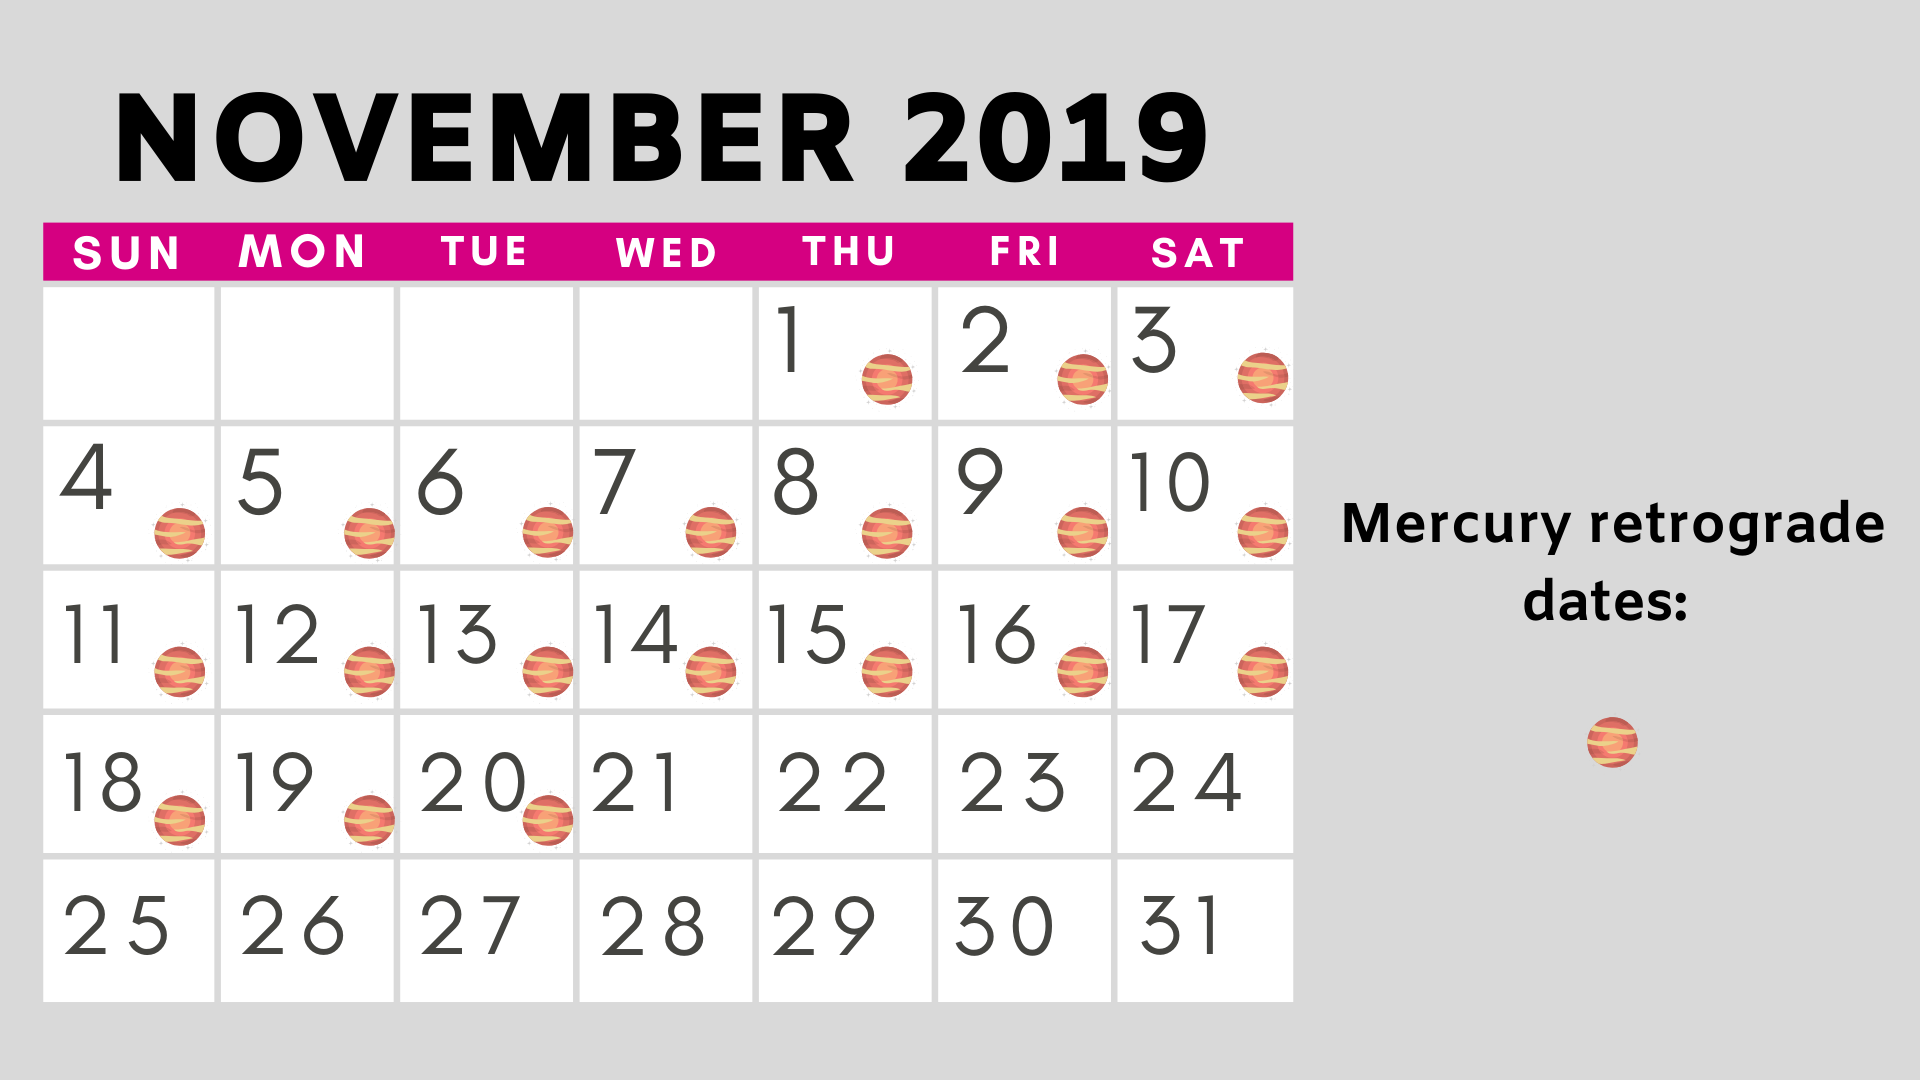 November Mercury retrograde